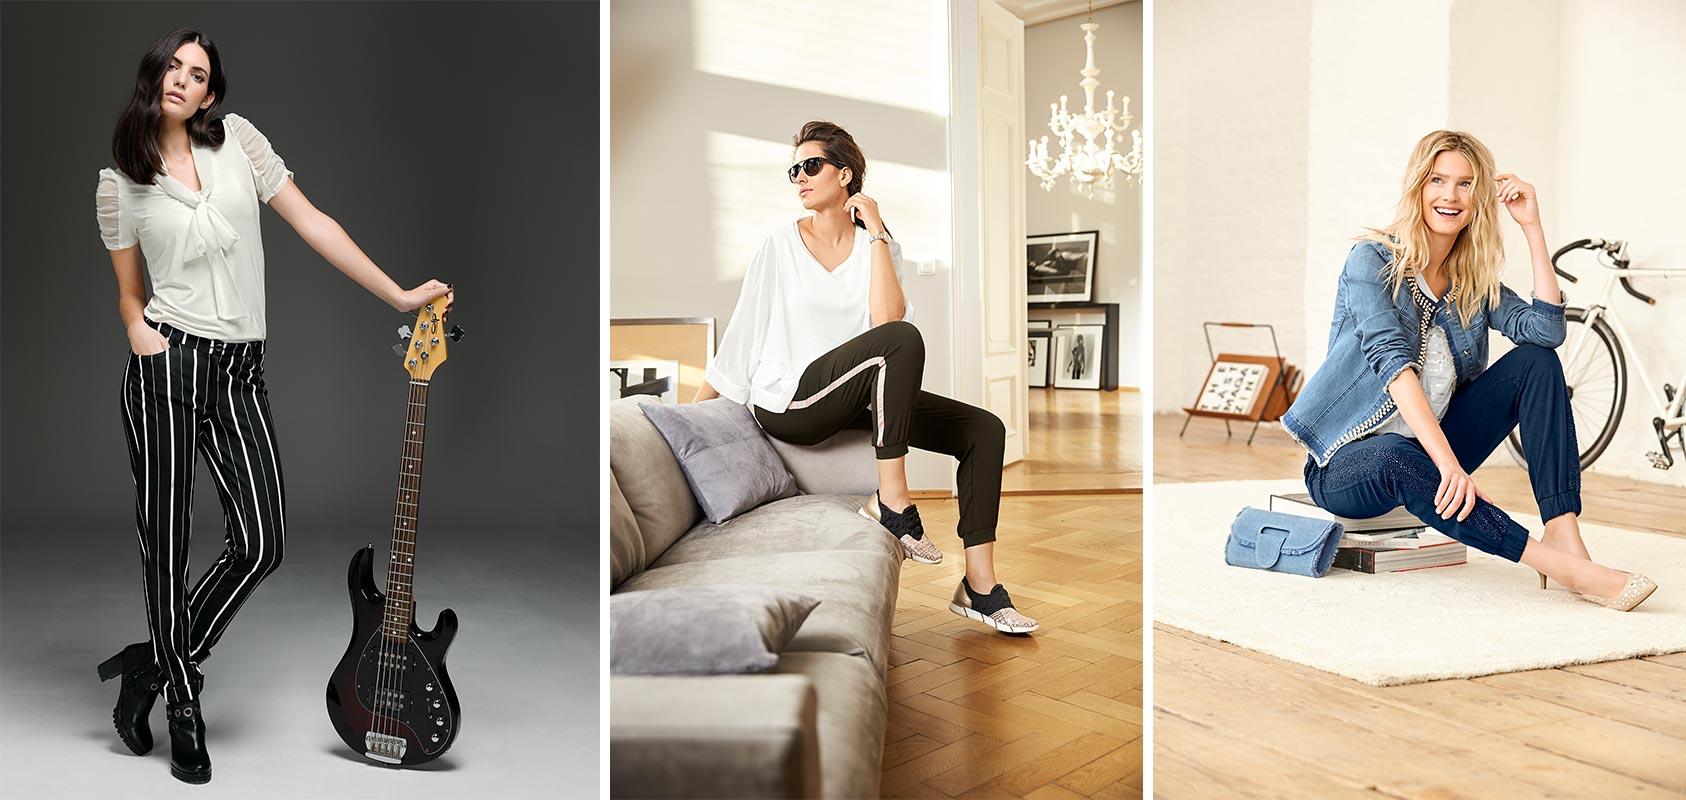 Jogginghose Elegant Kombinieren Styles Stories